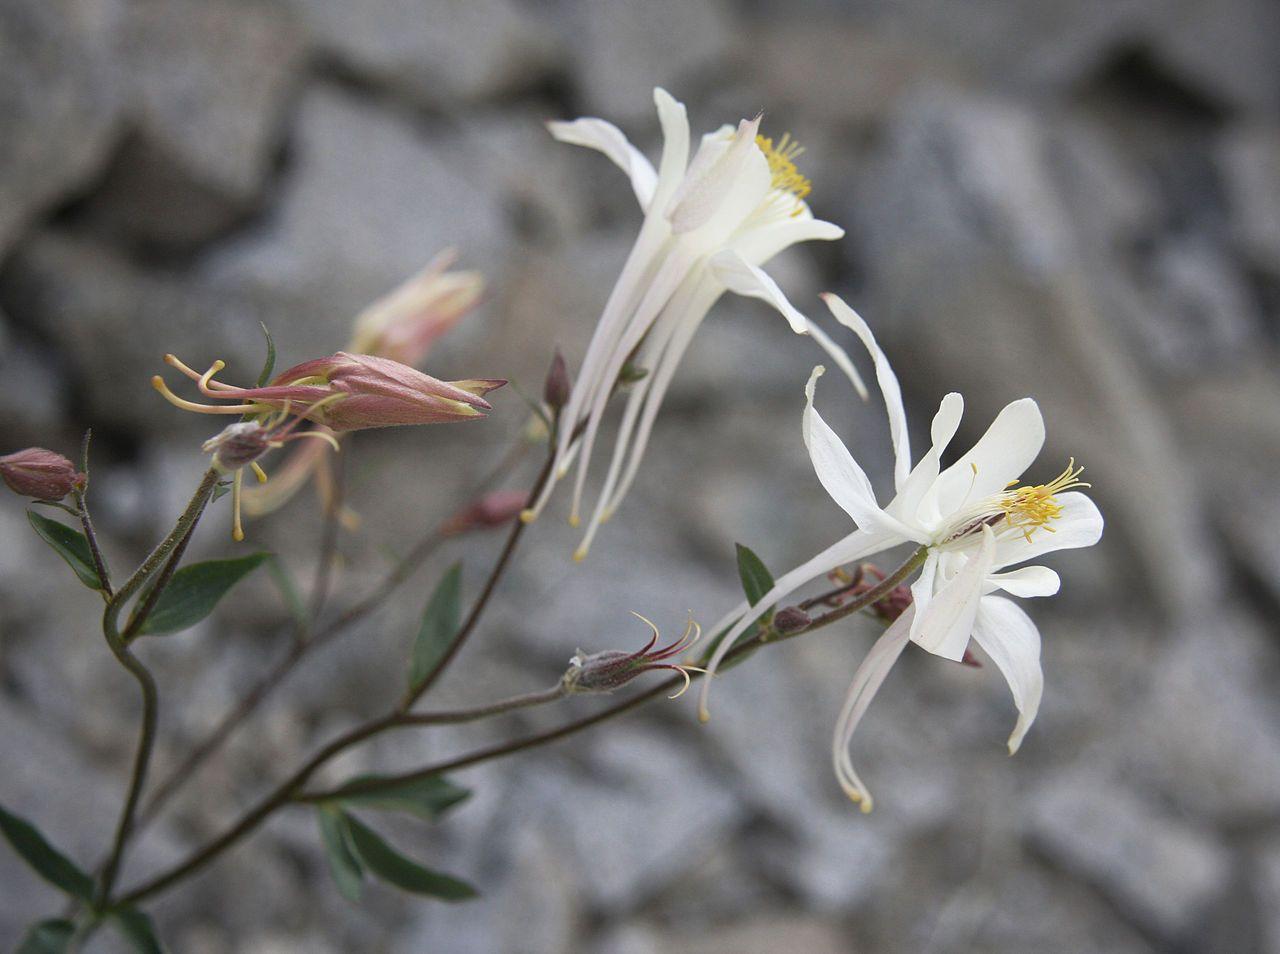 Aquilegia Pubescens Closeup Flora Of The Sierra Nevada Alpine Zone Wikipedia The Free Encyclopedia Sierra Nevada Sierra Nevada